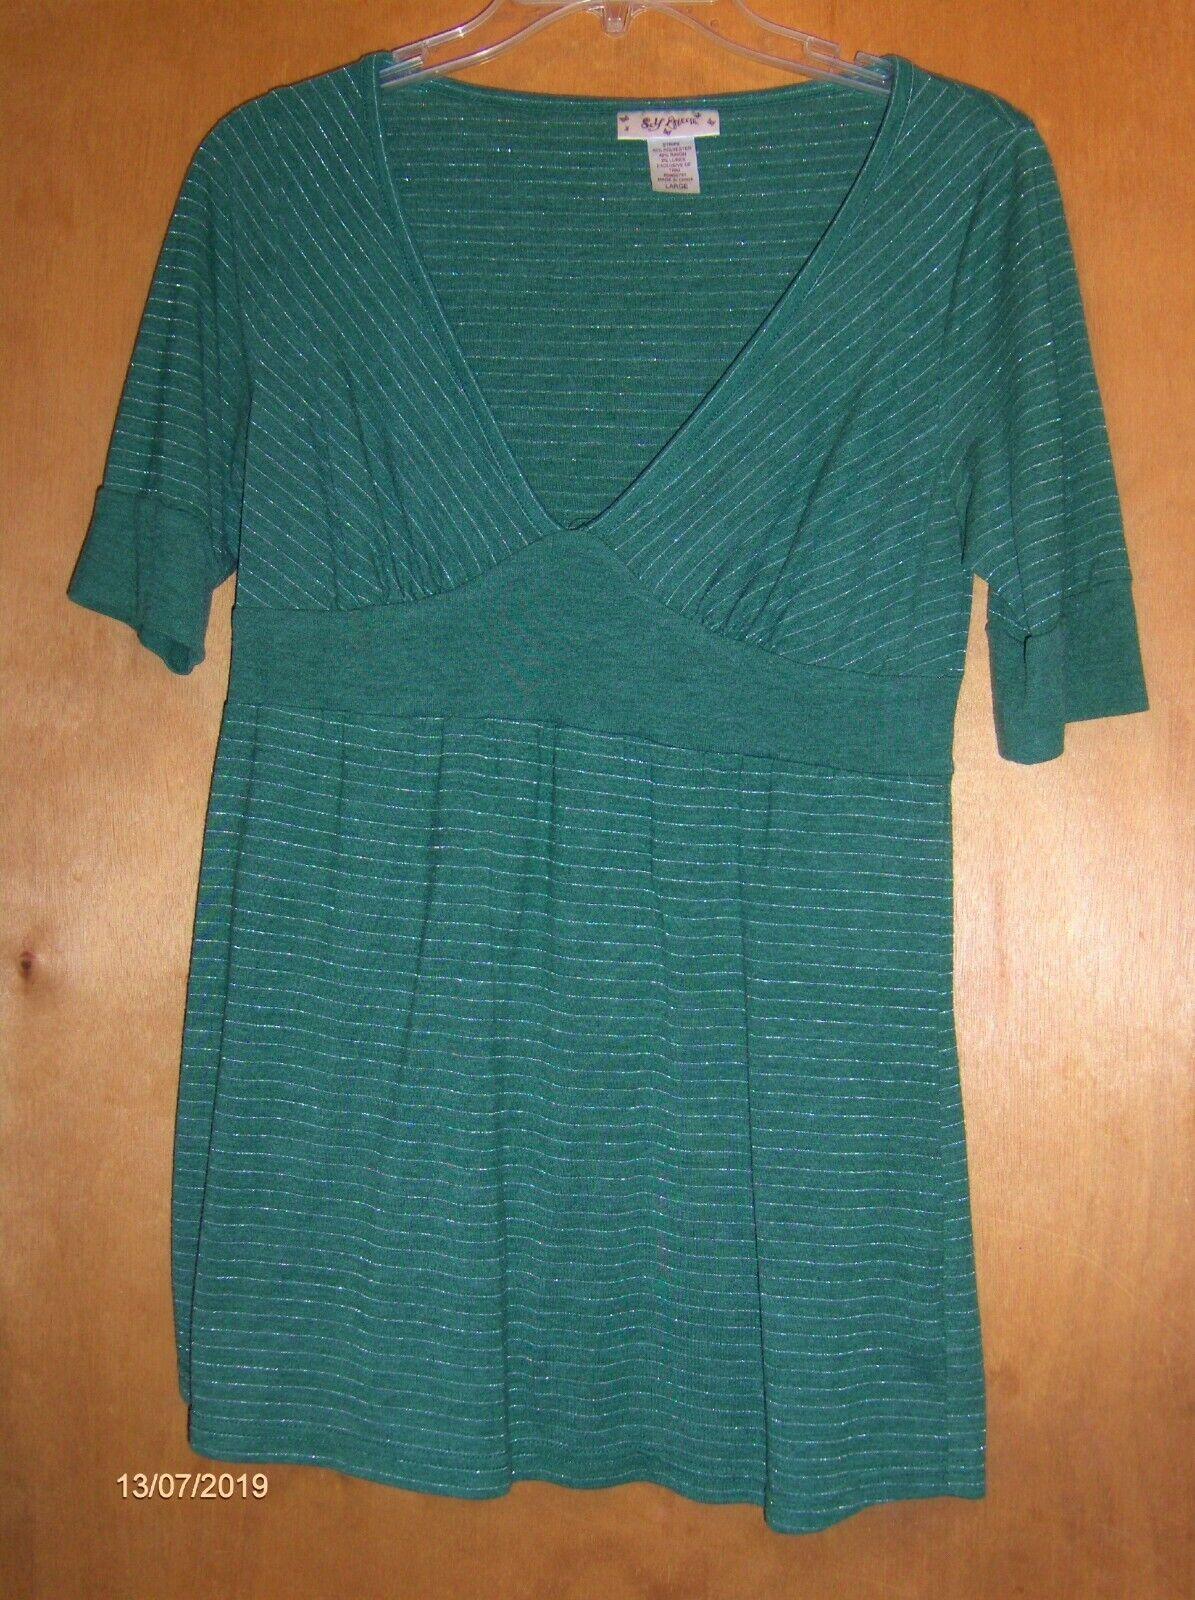 Ladies Self Esteem Green V-Neck Top      Size L 3